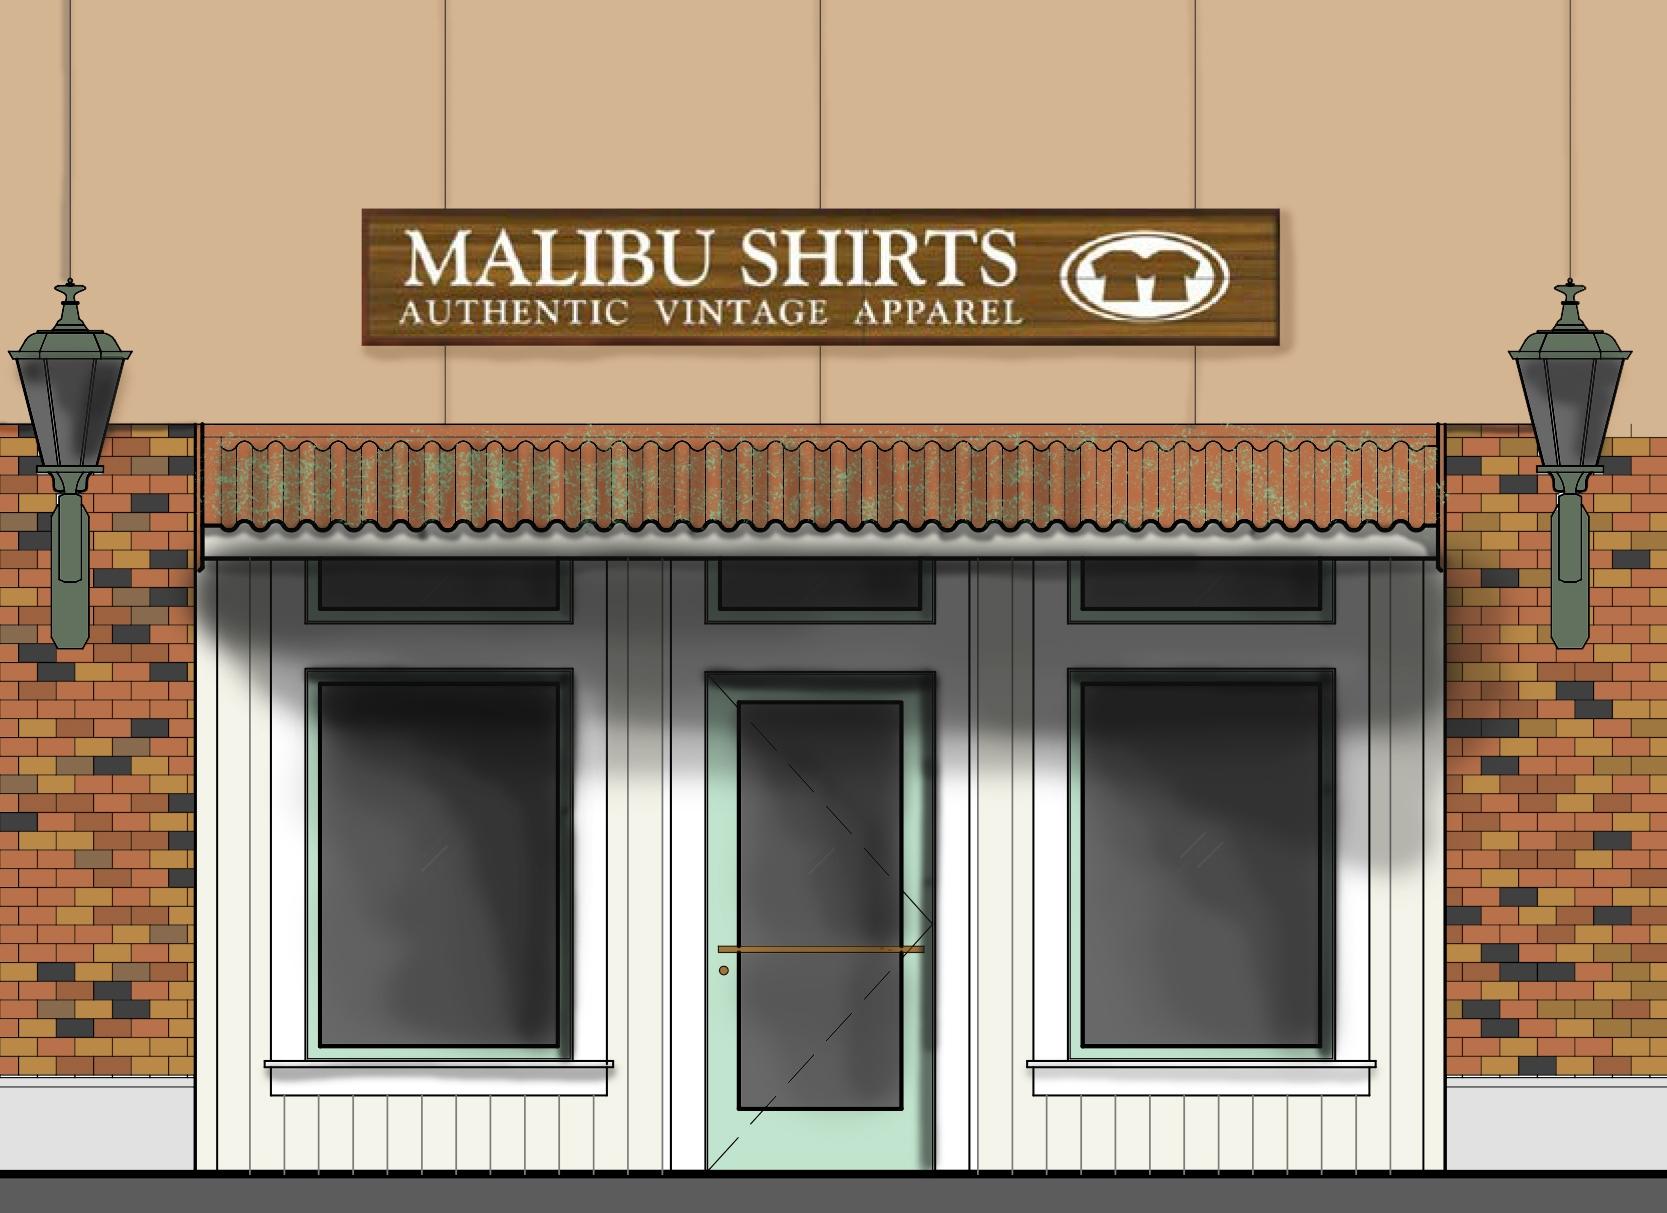 Malibu-Storefront-Rendering-4-9-2016.jpg